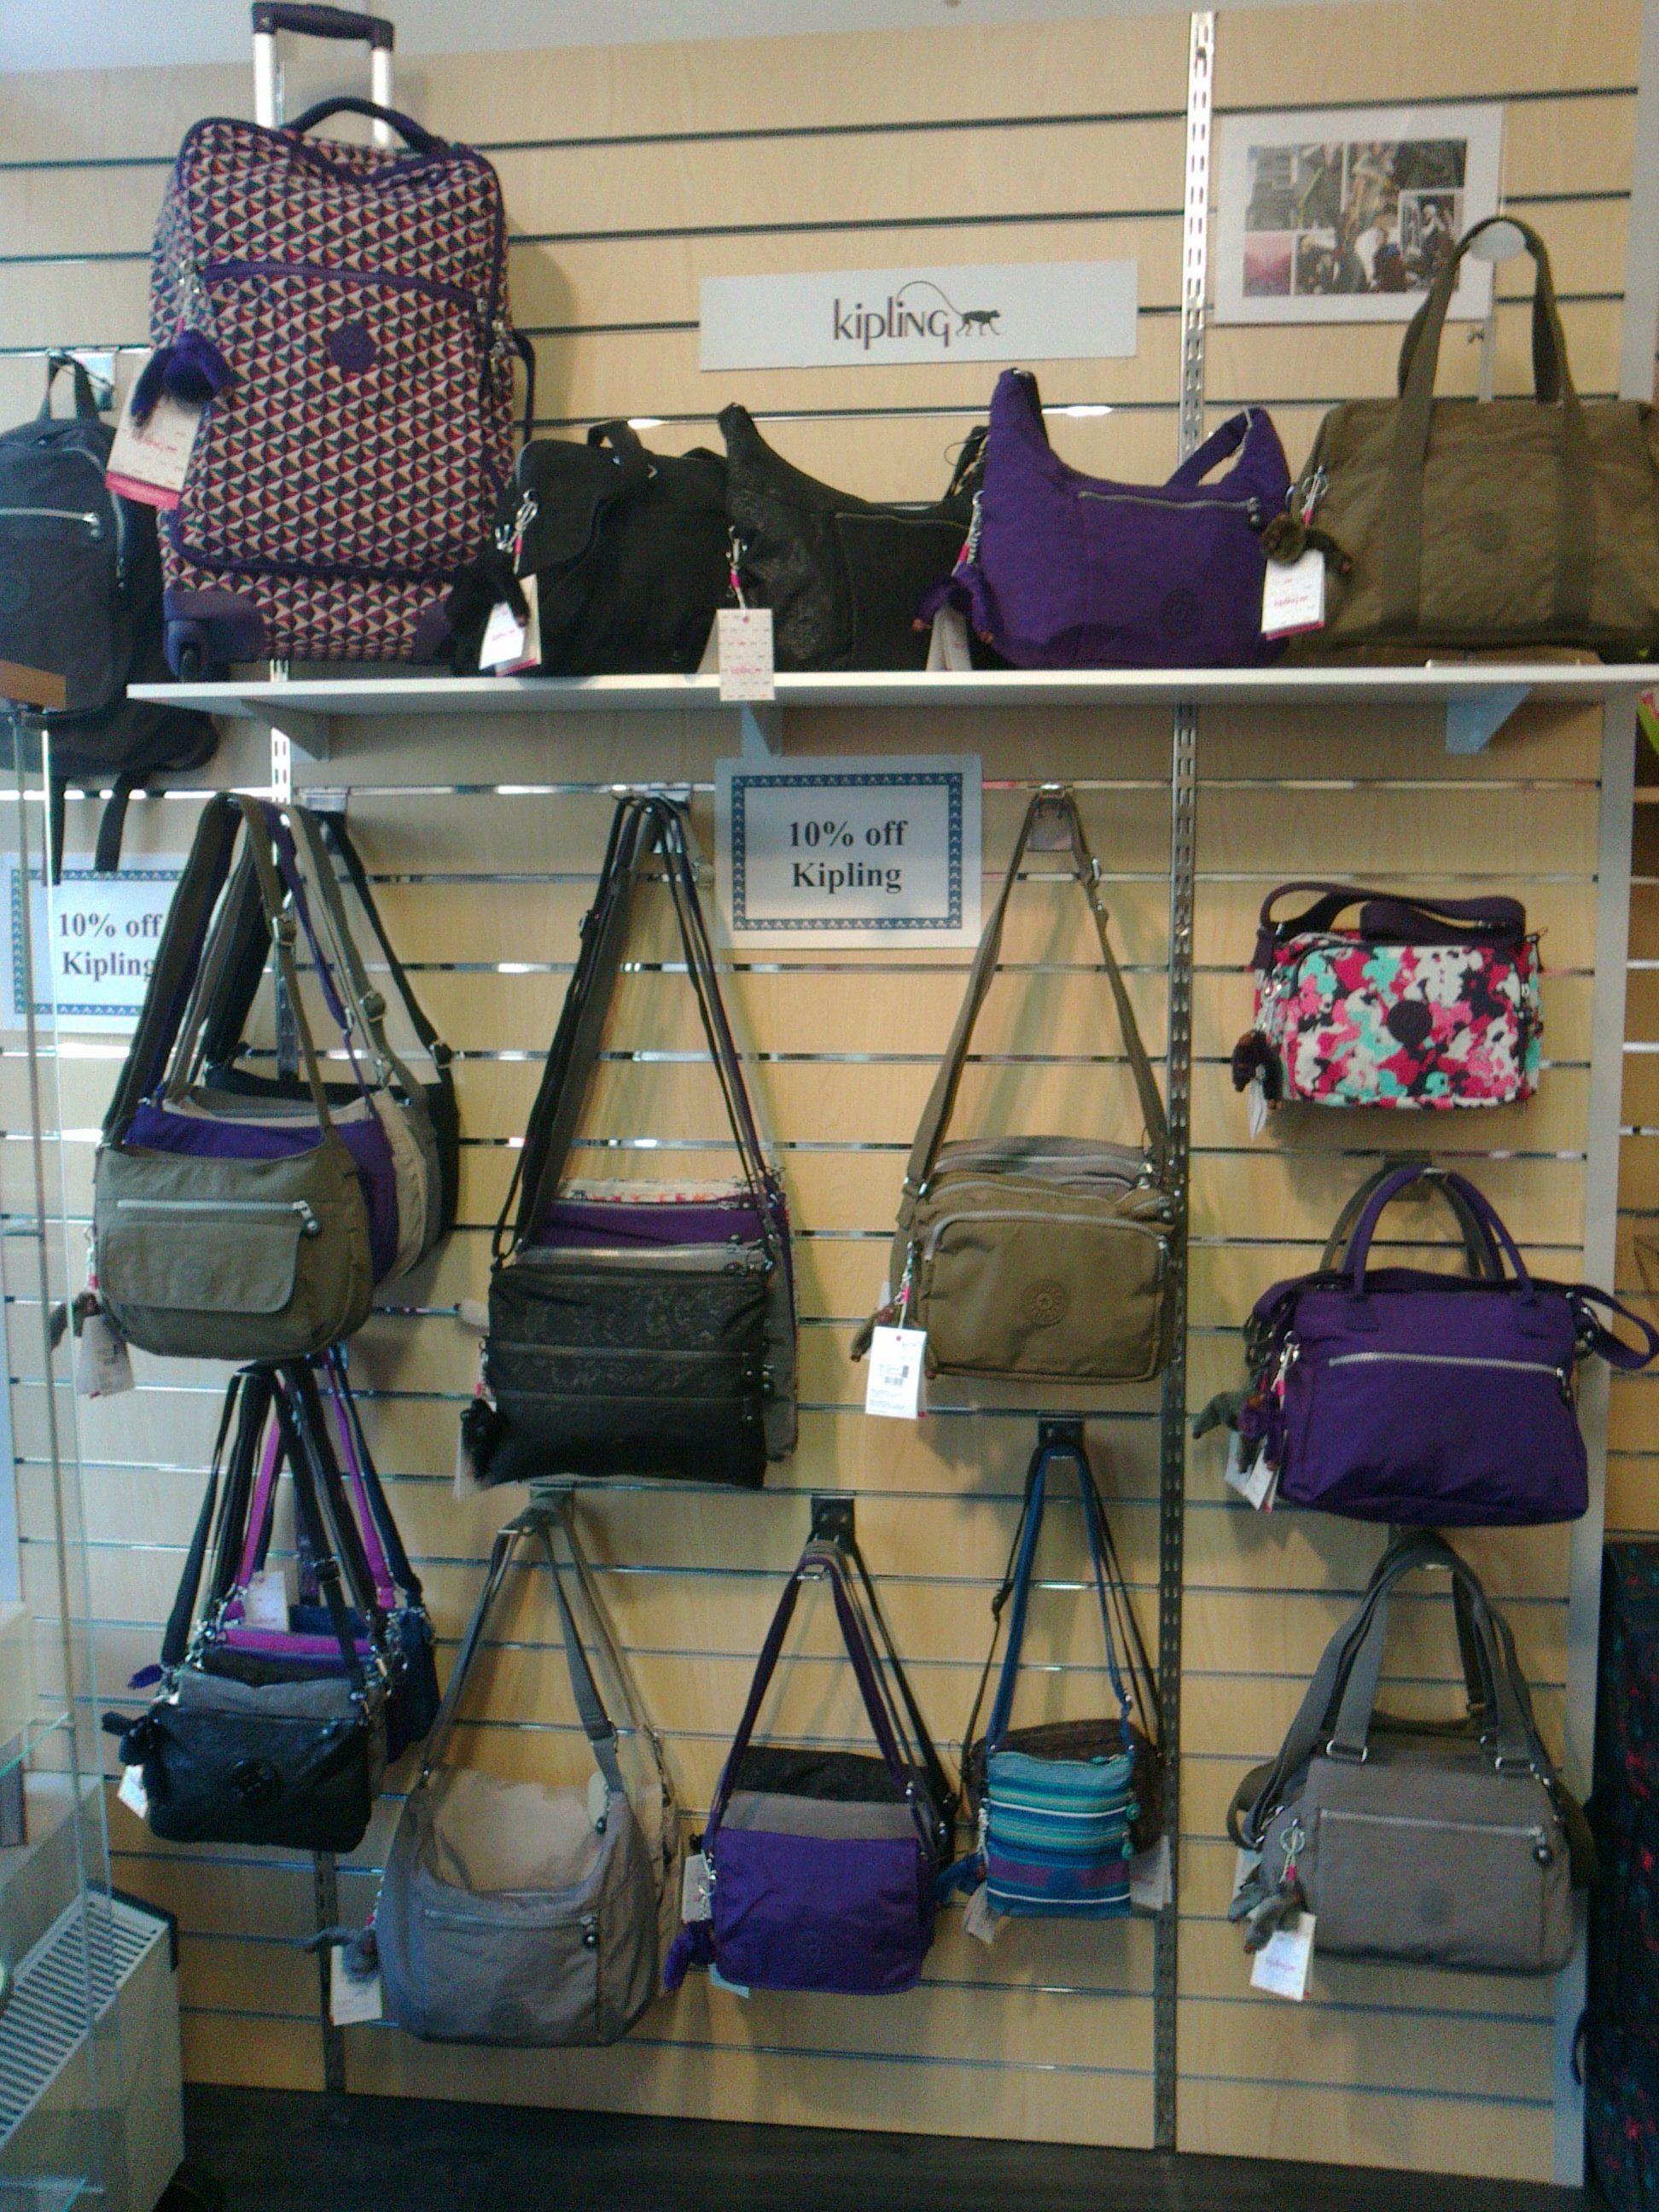 Kipling Bags http://www.luggage-case.co.uk/ | showroom | Pinterest